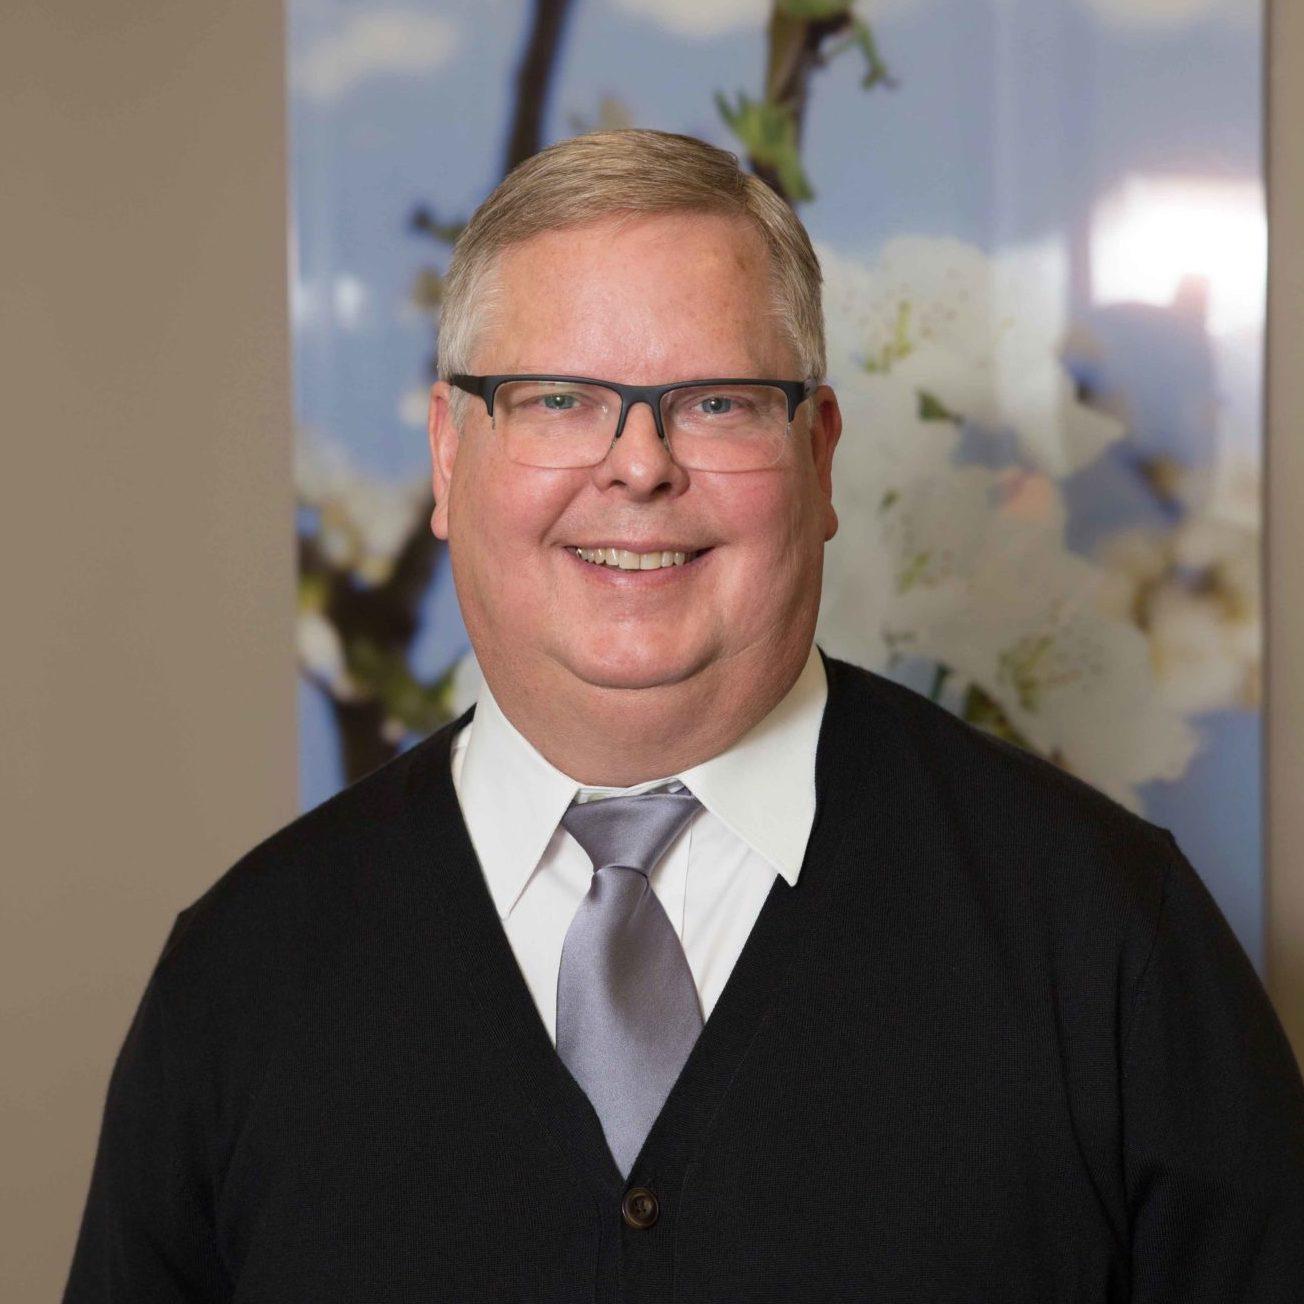 Michael J. Helgeson,  D.D.S. Headshot